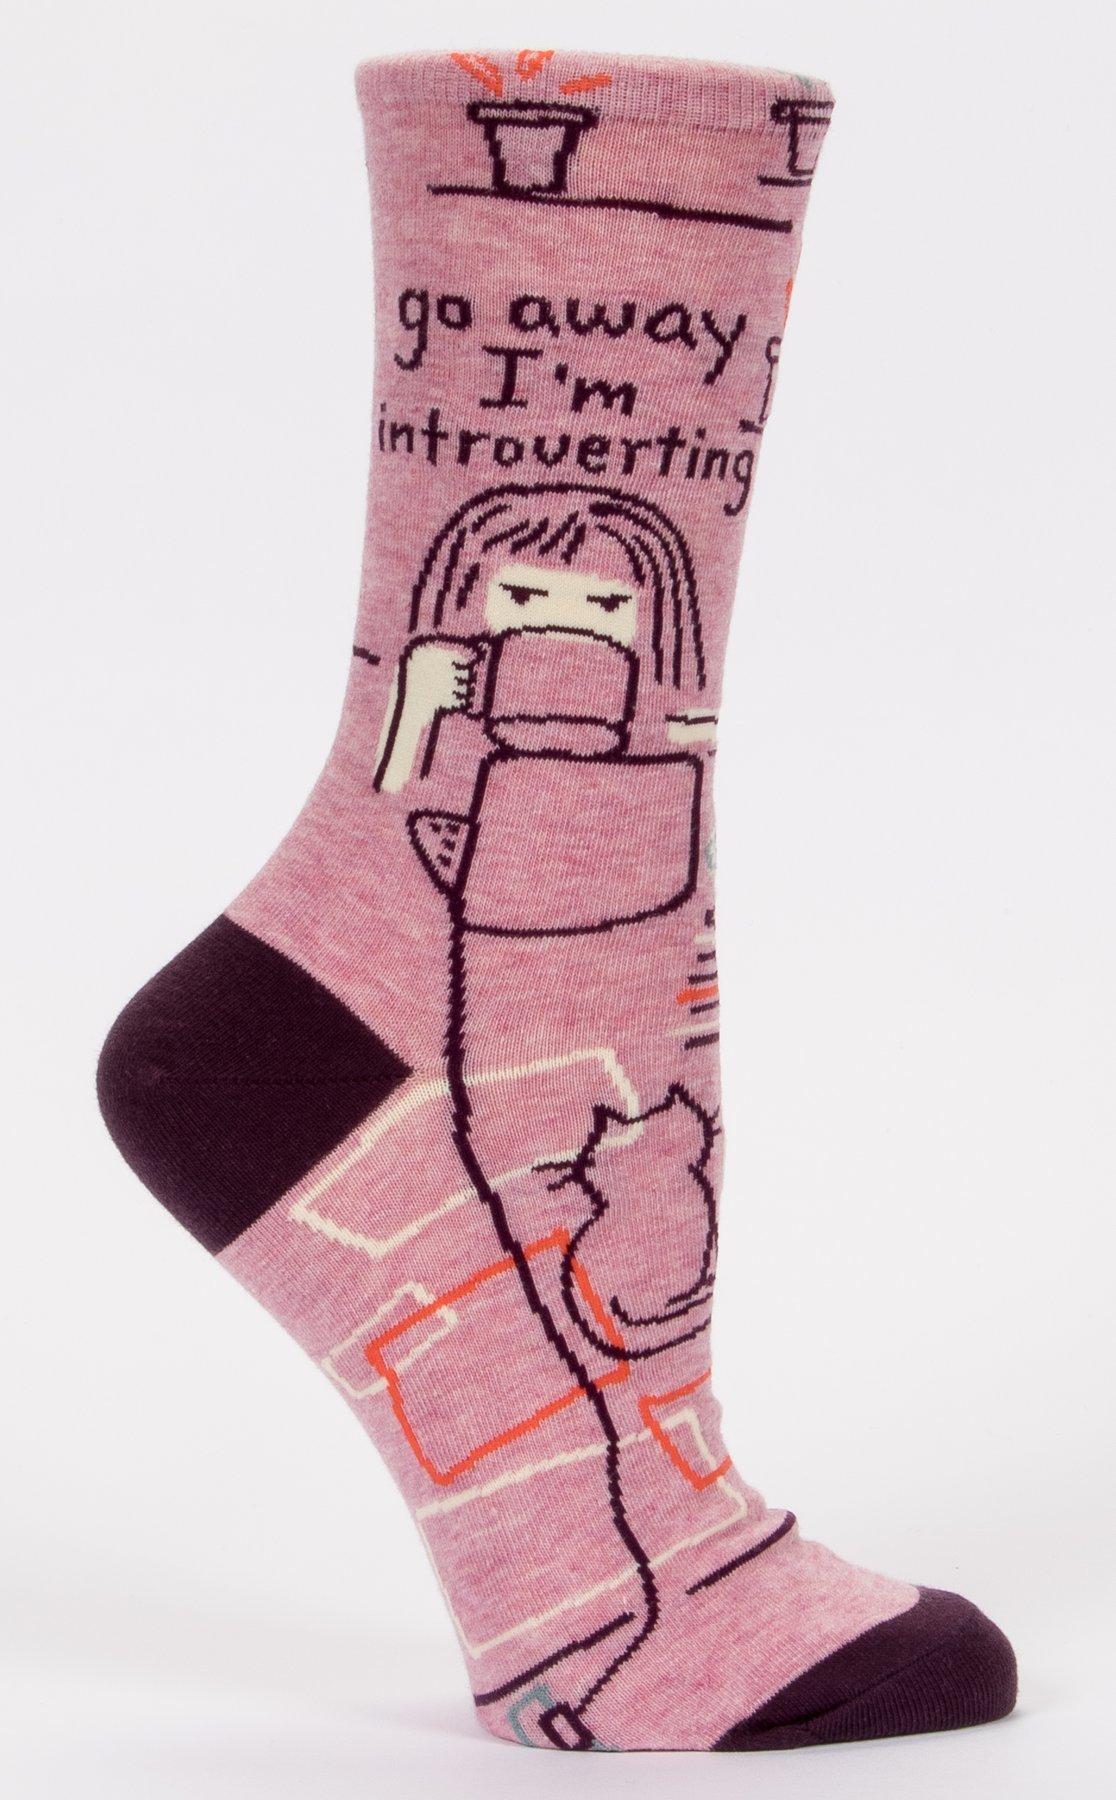 Ladies Socks: Go AwayI'mIntroverting